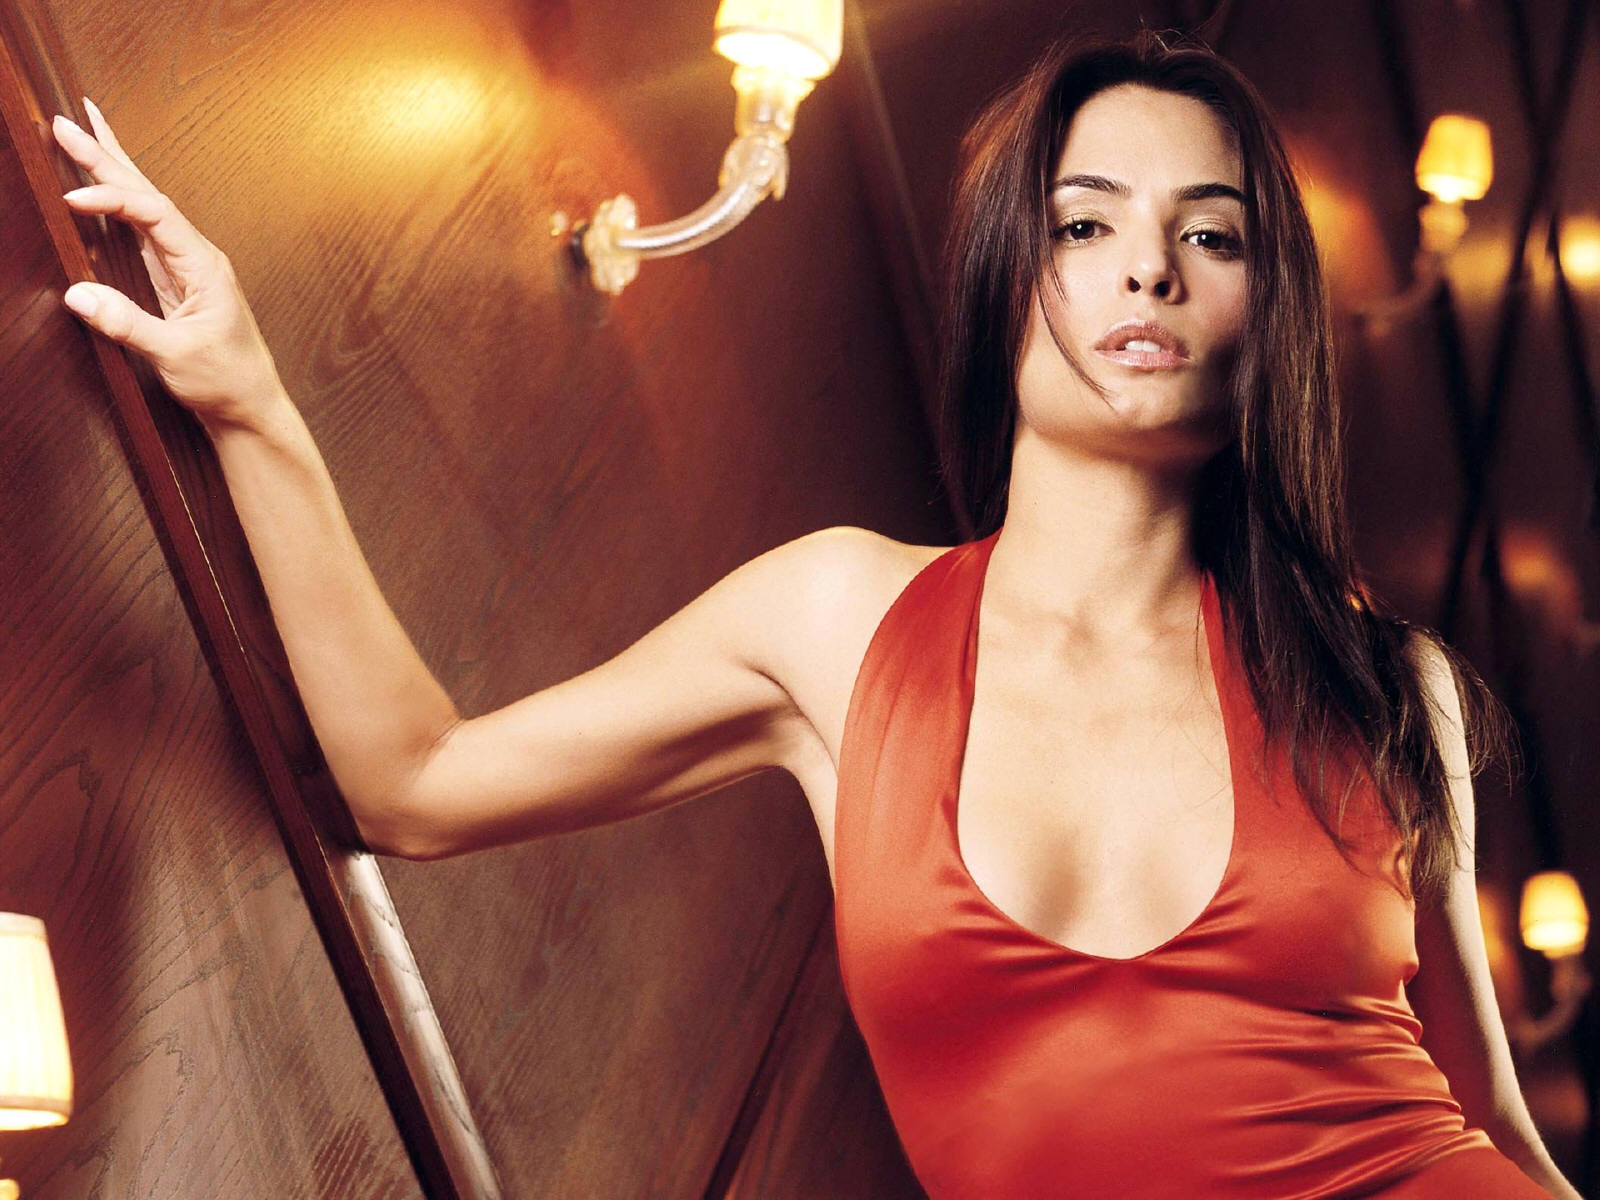 http://1.bp.blogspot.com/-xXwvK94eHss/Ty63jUIX4hI/AAAAAAAAB04/JIqWioSBvzs/s1600/0134-Hot-Celebrity-Wallpaper-Talisa-Soto.jpg